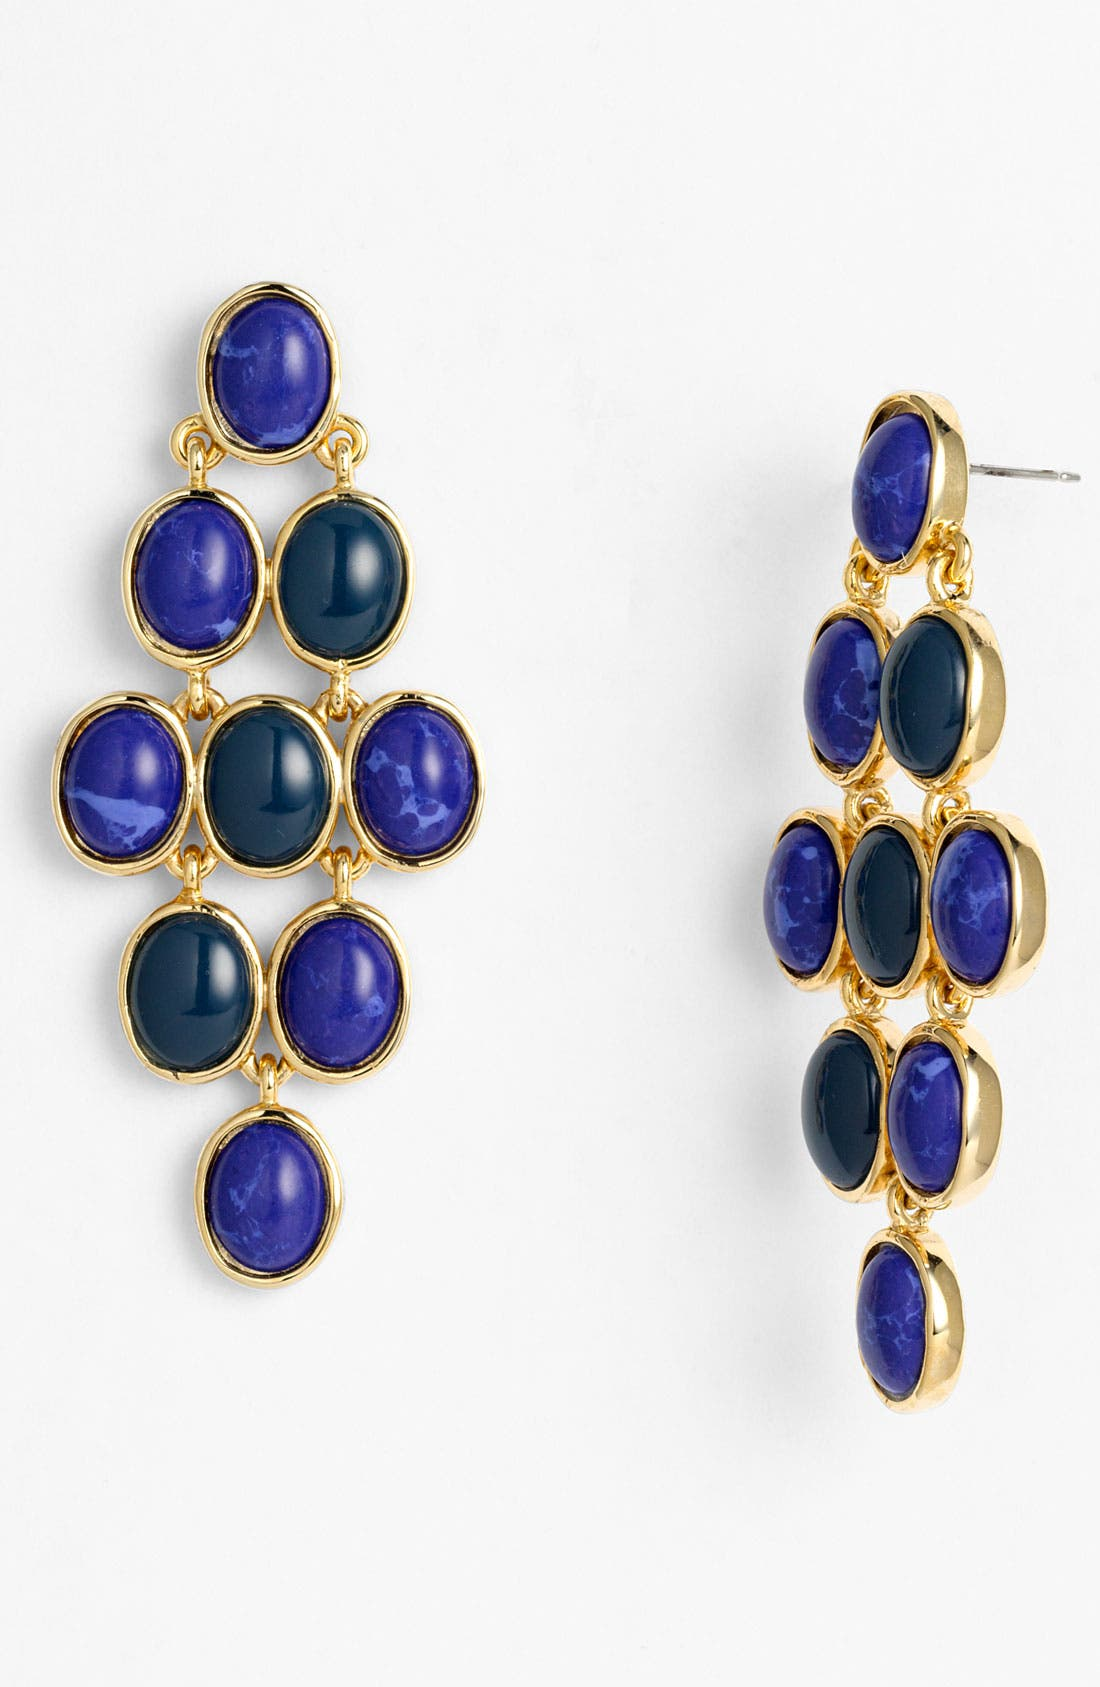 Alternate Image 1 Selected - Nordstrom 'Lapis of Luxury' Kite Earrings